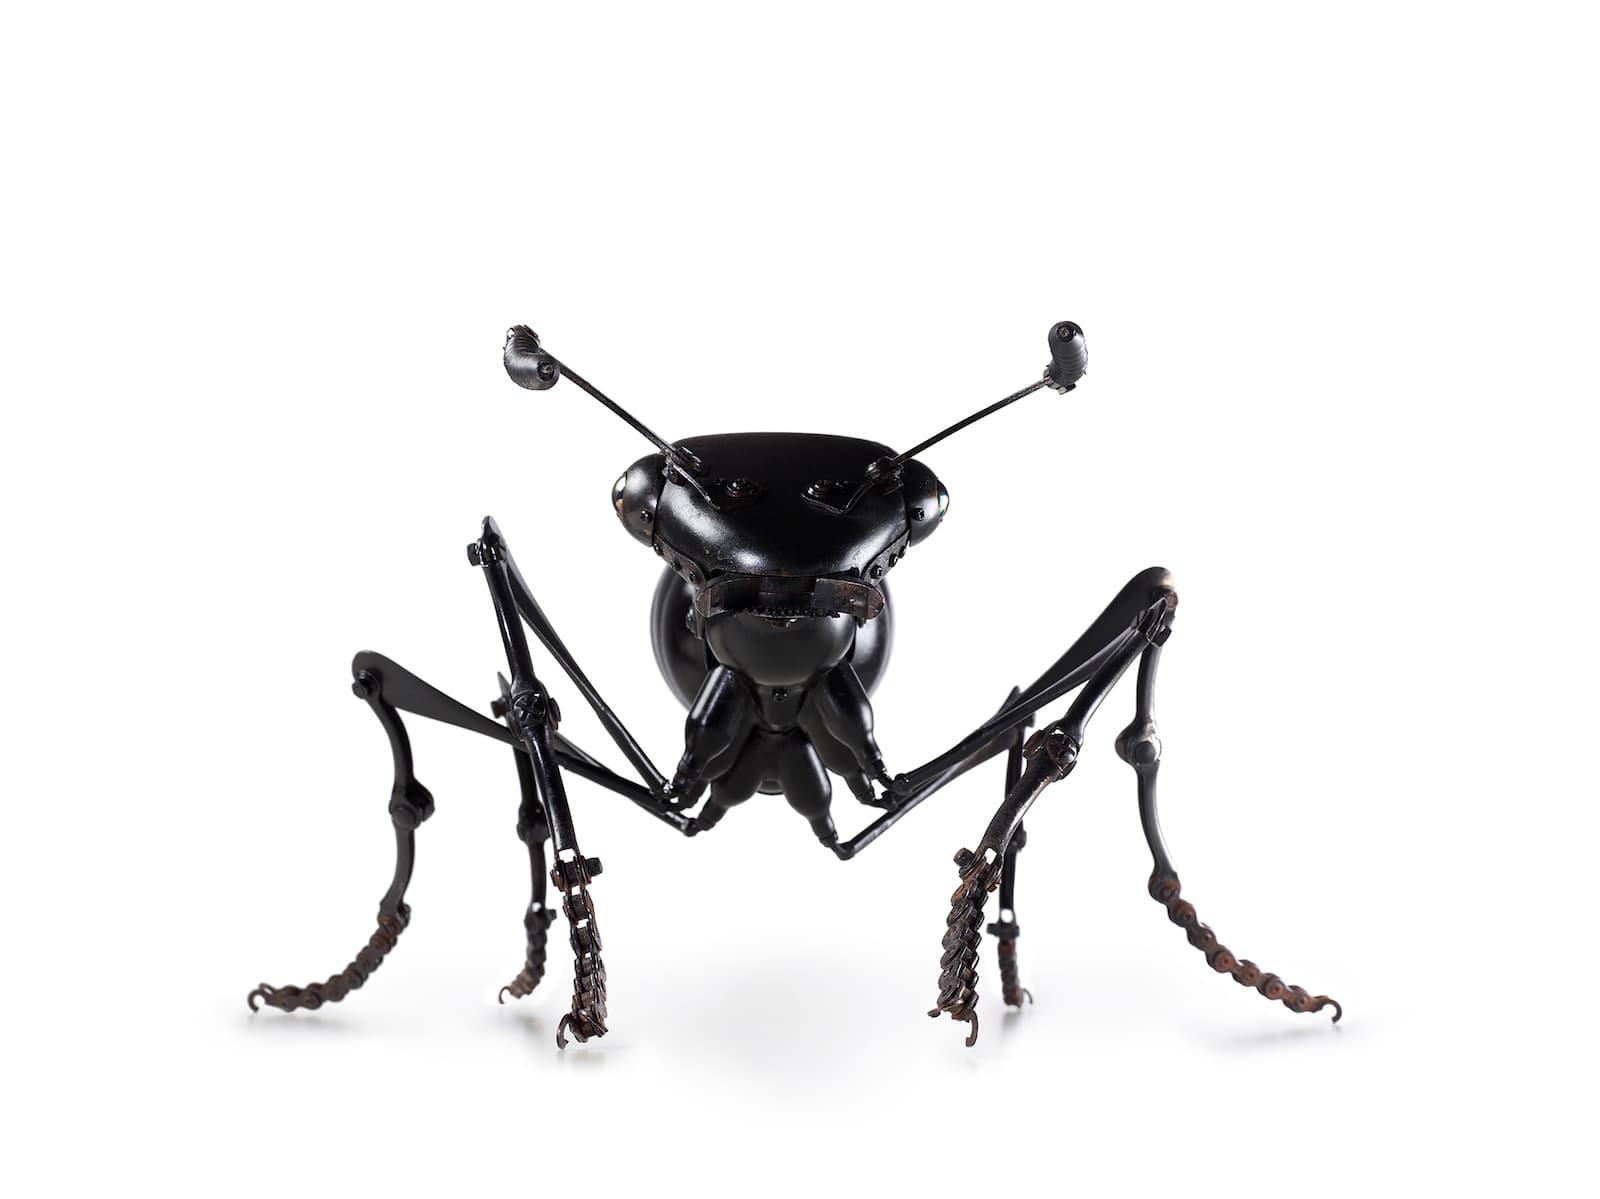 Edouard Martinet - Insekten aus alten Fahrzeugteilen